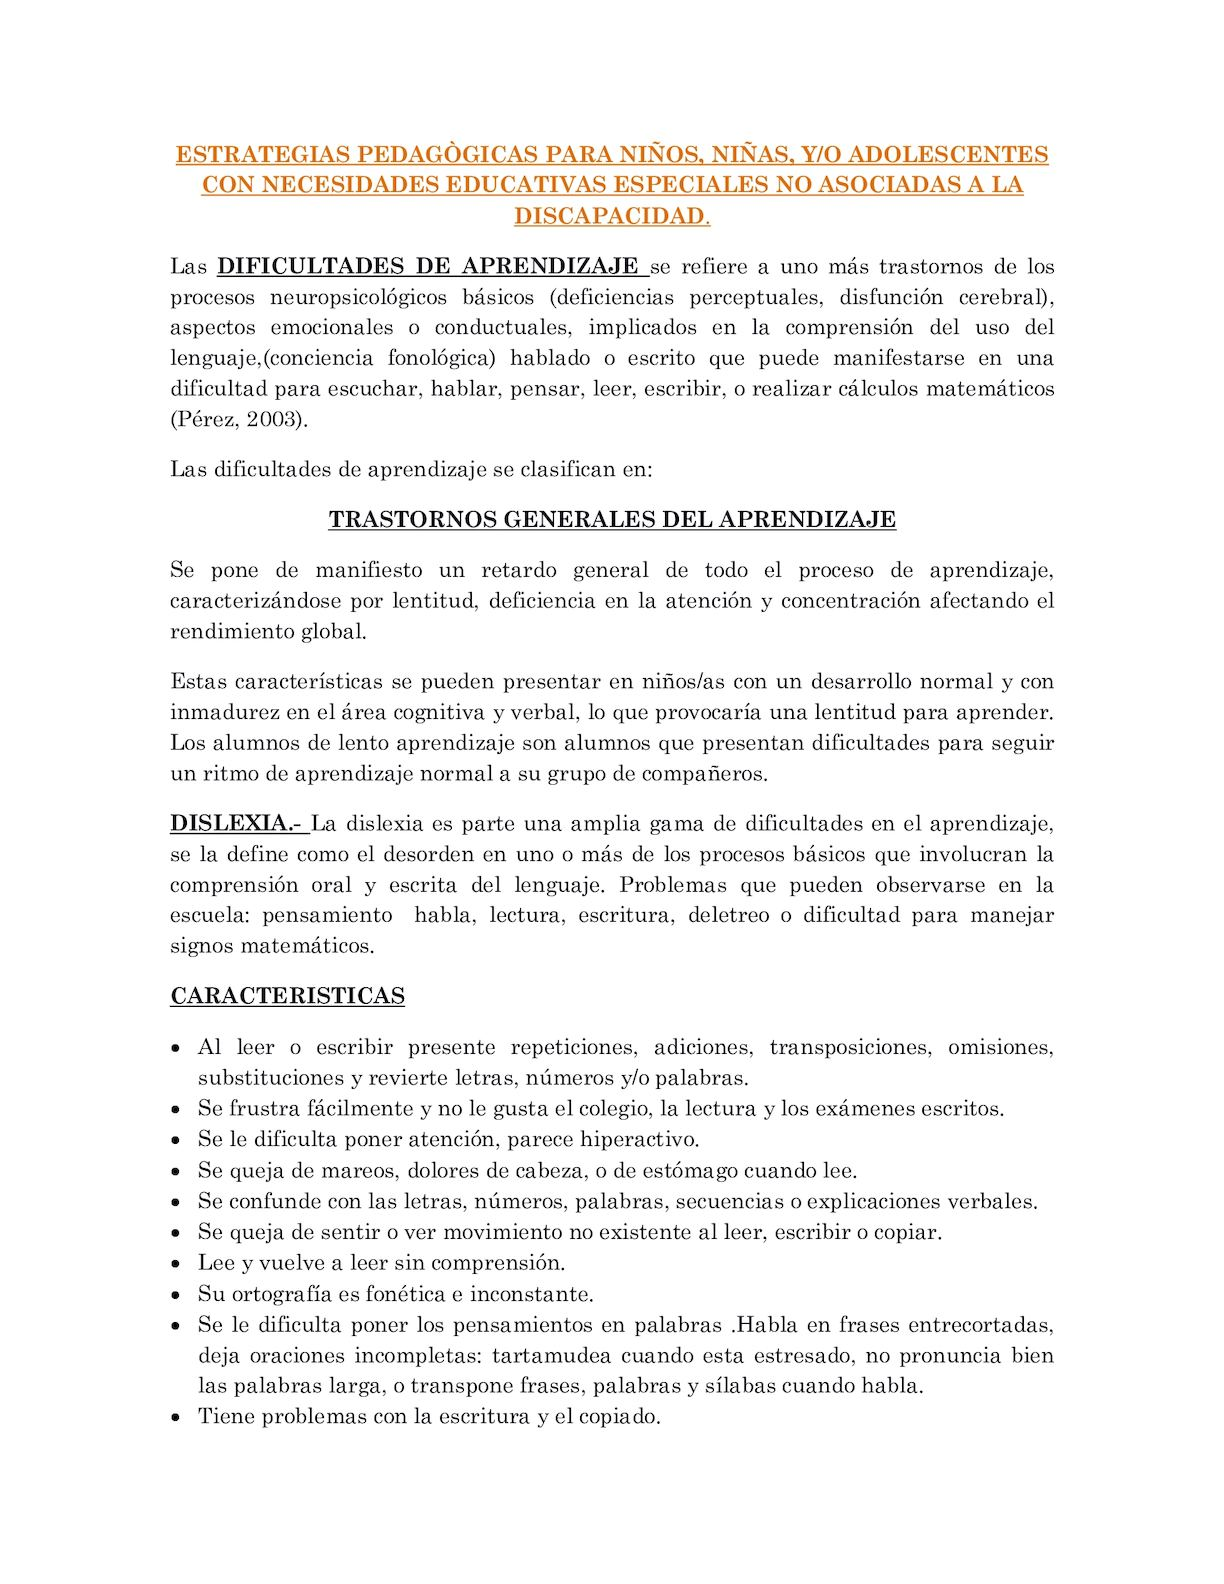 Calaméo - Adaptaciones Estrategias Pedagògicas Para Niños